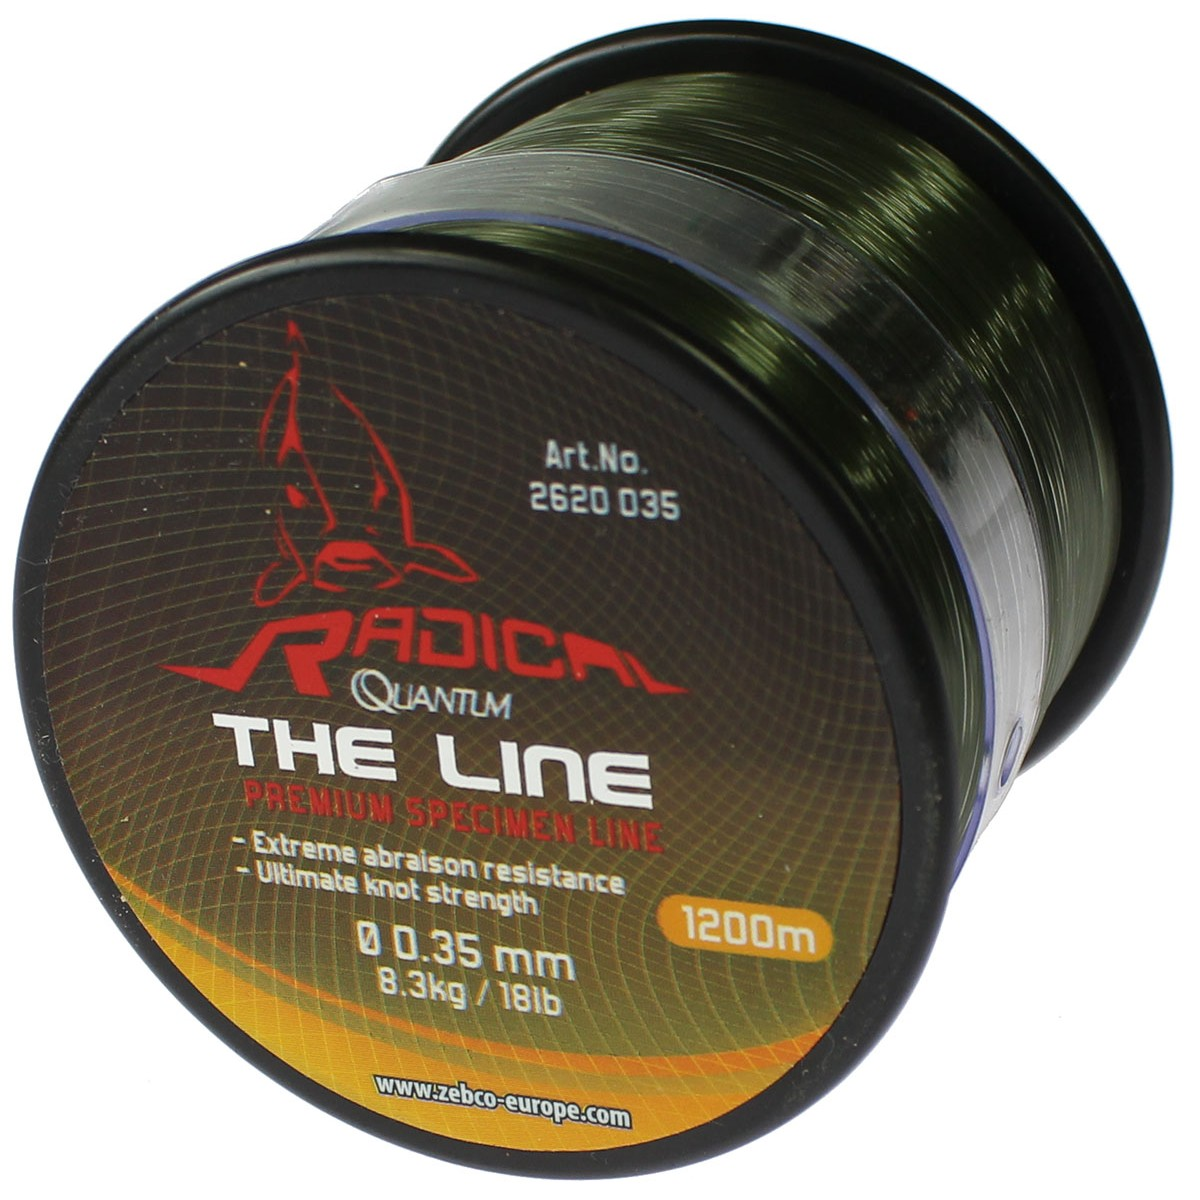 Quantum Radical The Line-риболовно влакно-шаранско влакно